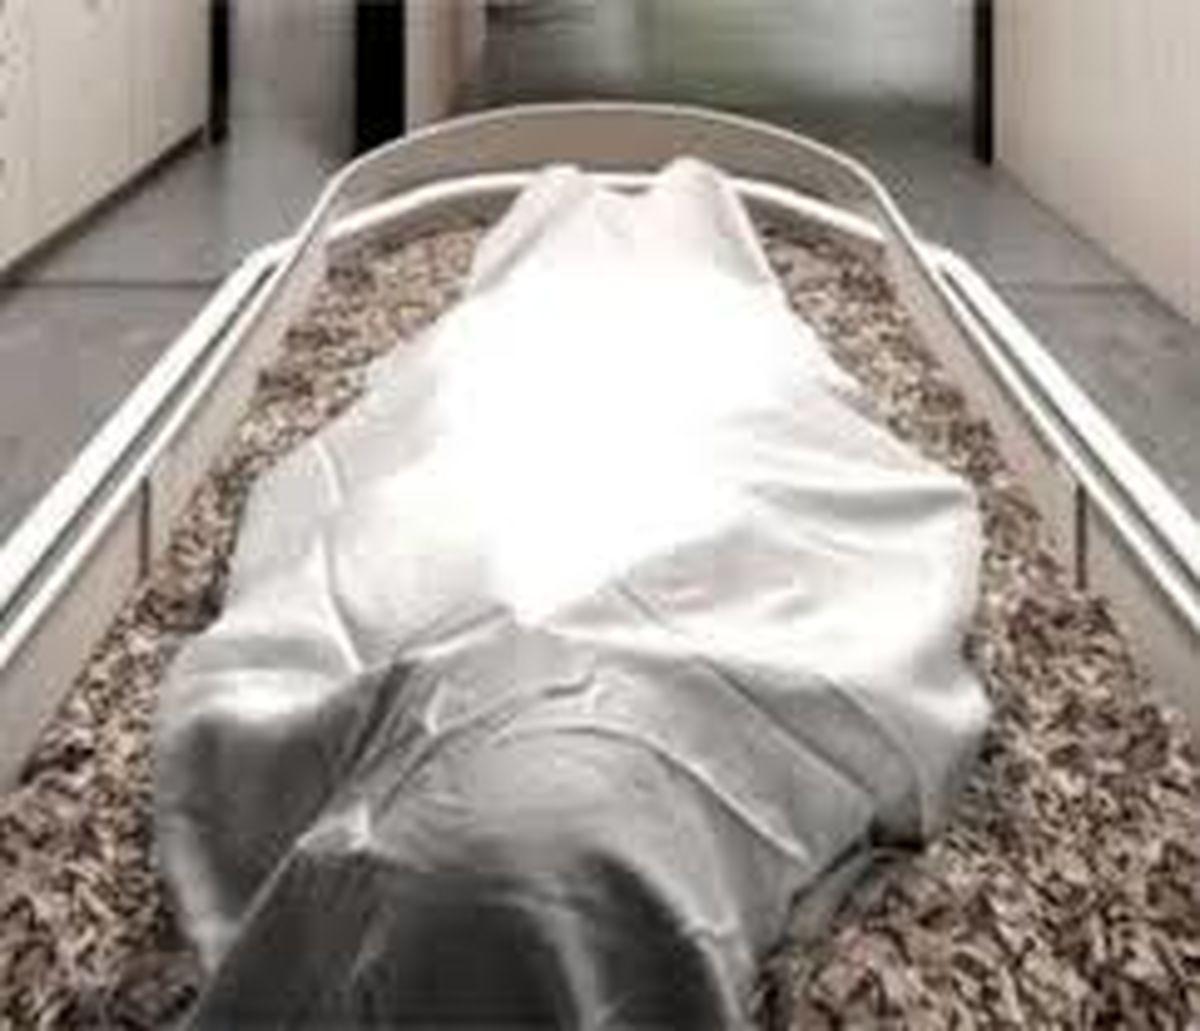 مرگ هولناک زن تهرانی به علت بدگمانی شوهرش+عکس و جزئیات